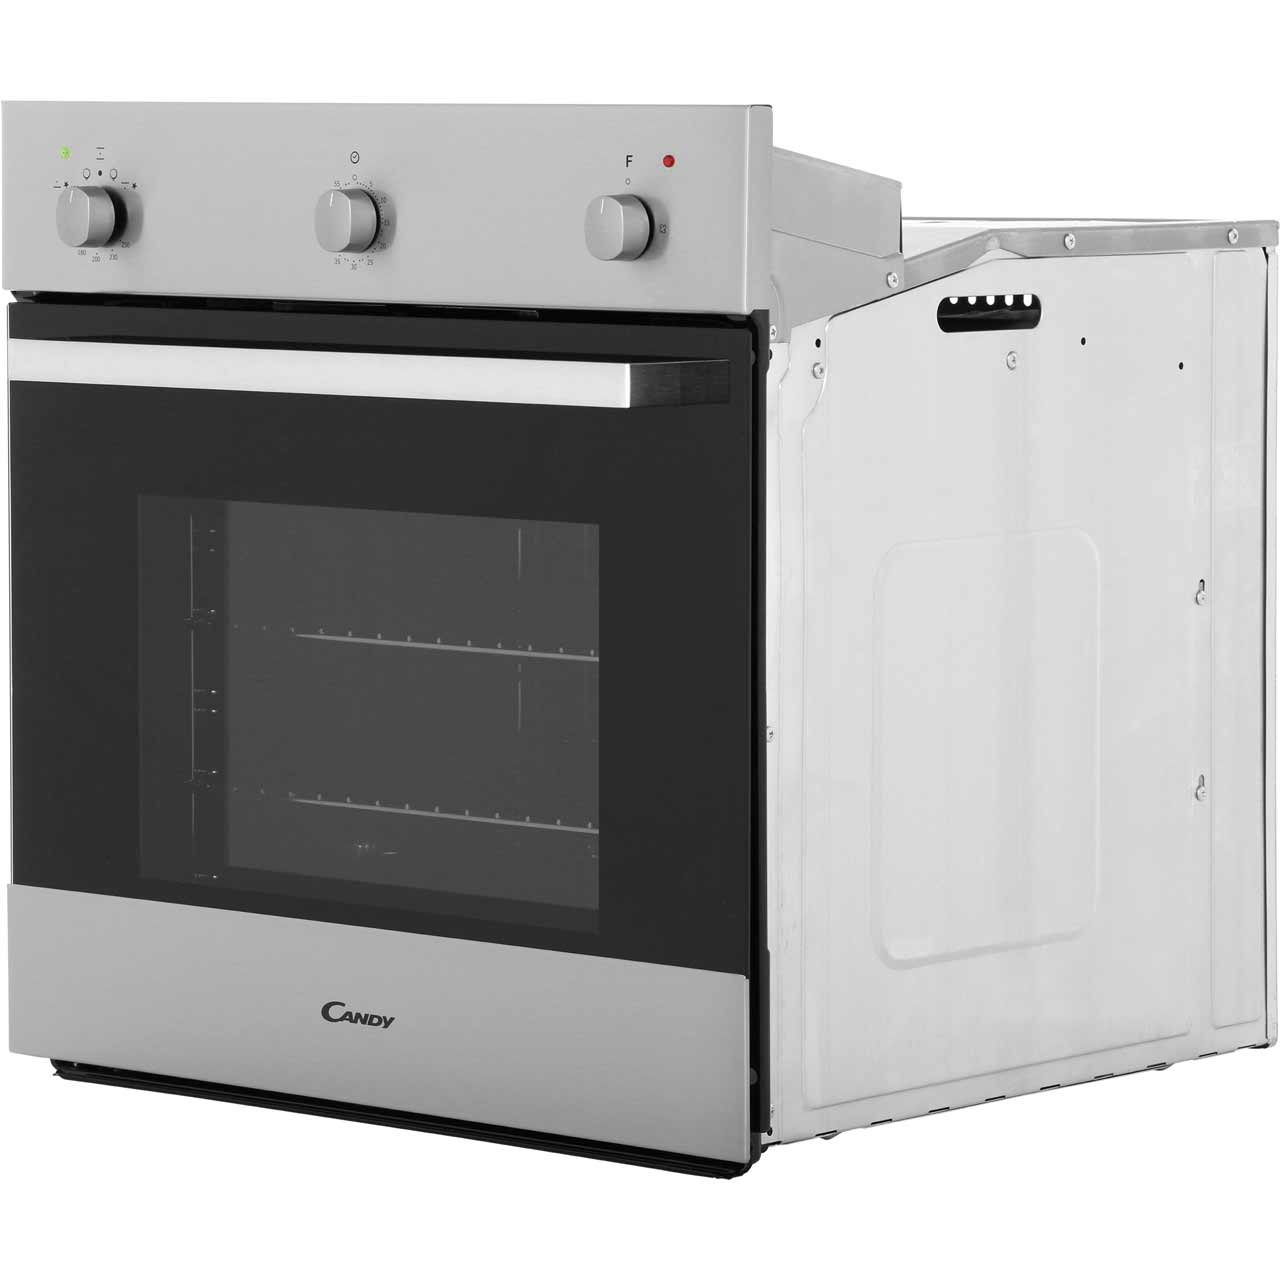 Chocolate Nonpareils White Dunmore Candy Kitchen: Washing Machines, Fridges & More